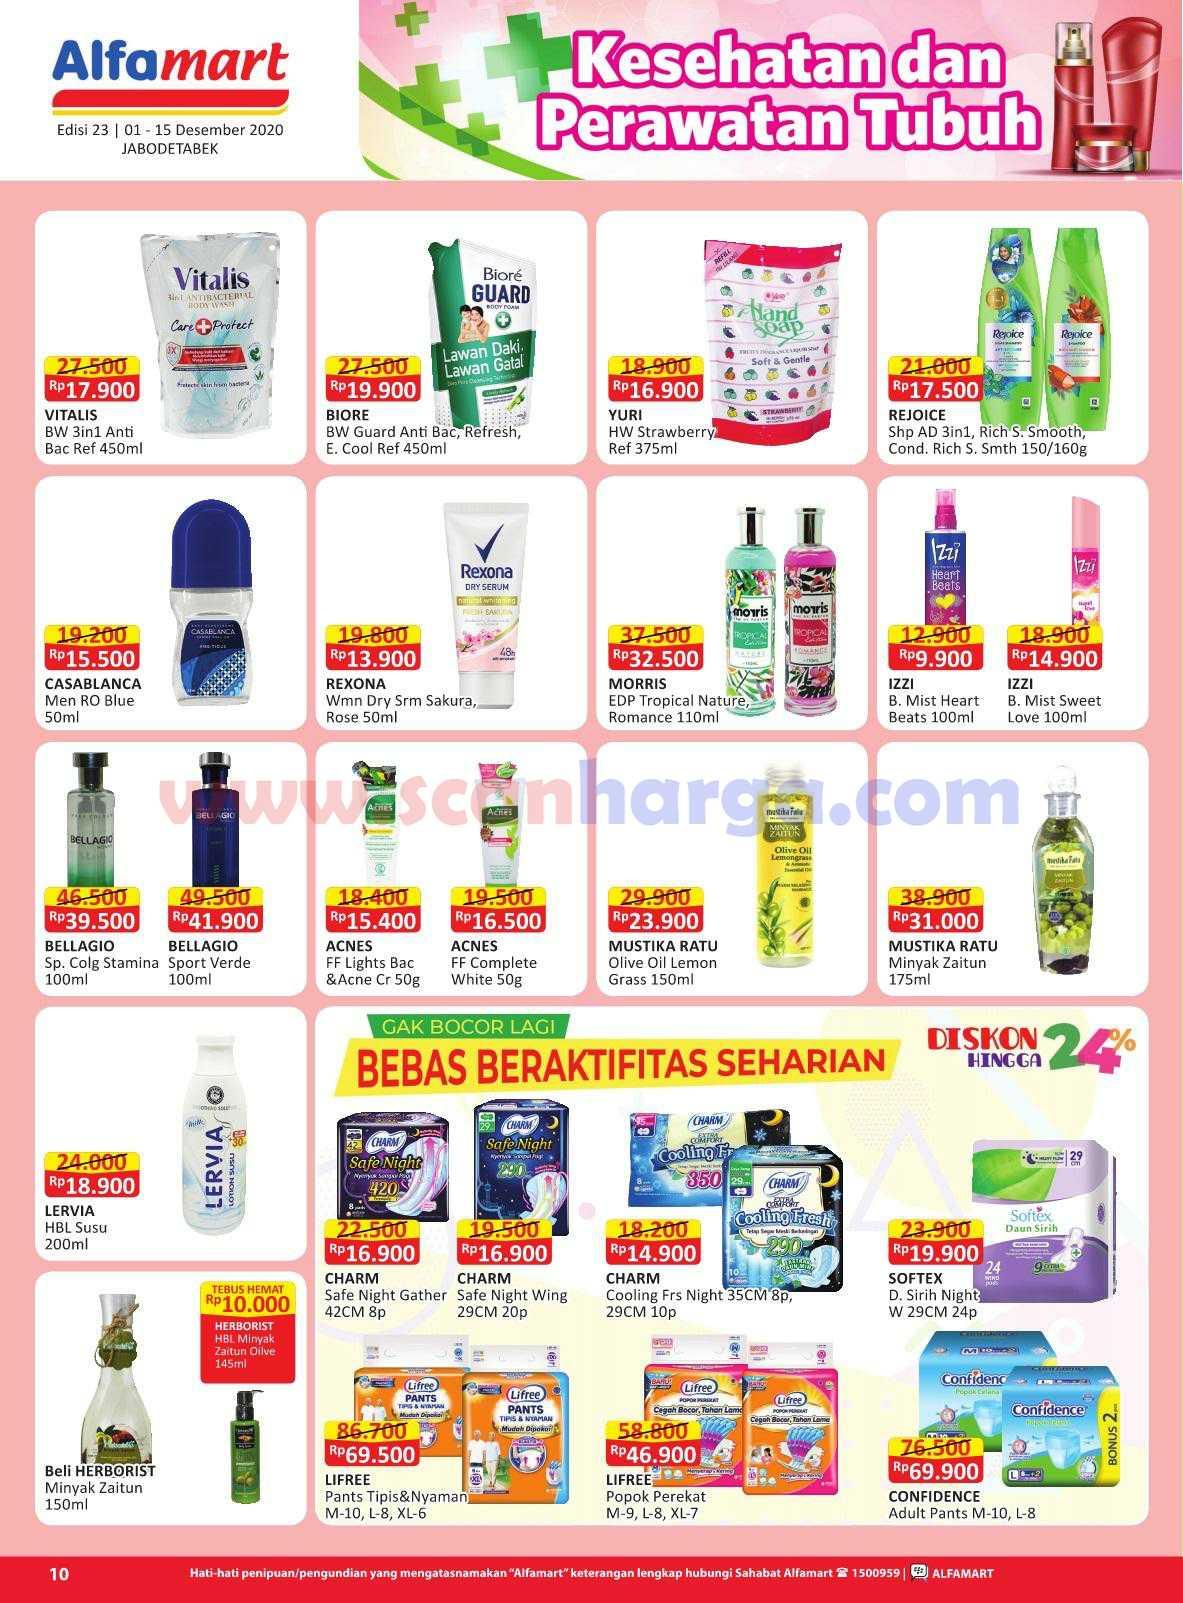 Katalog Promo Alfamart 1 - 15 Desember 2020 10